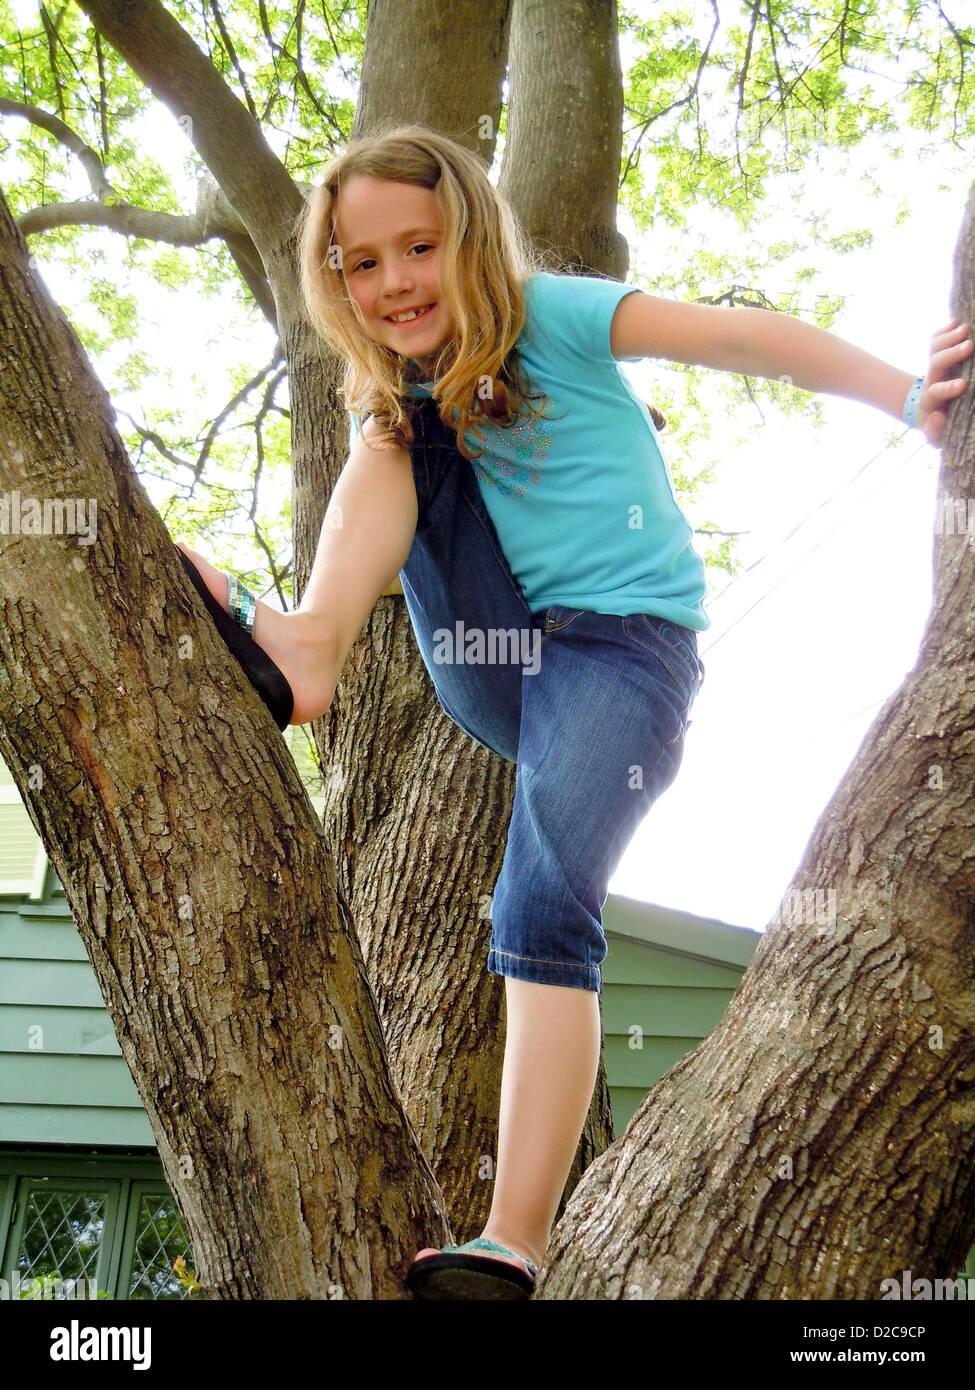 7-Year-Old Girl, Winchester, Massachusetts - Stock Image